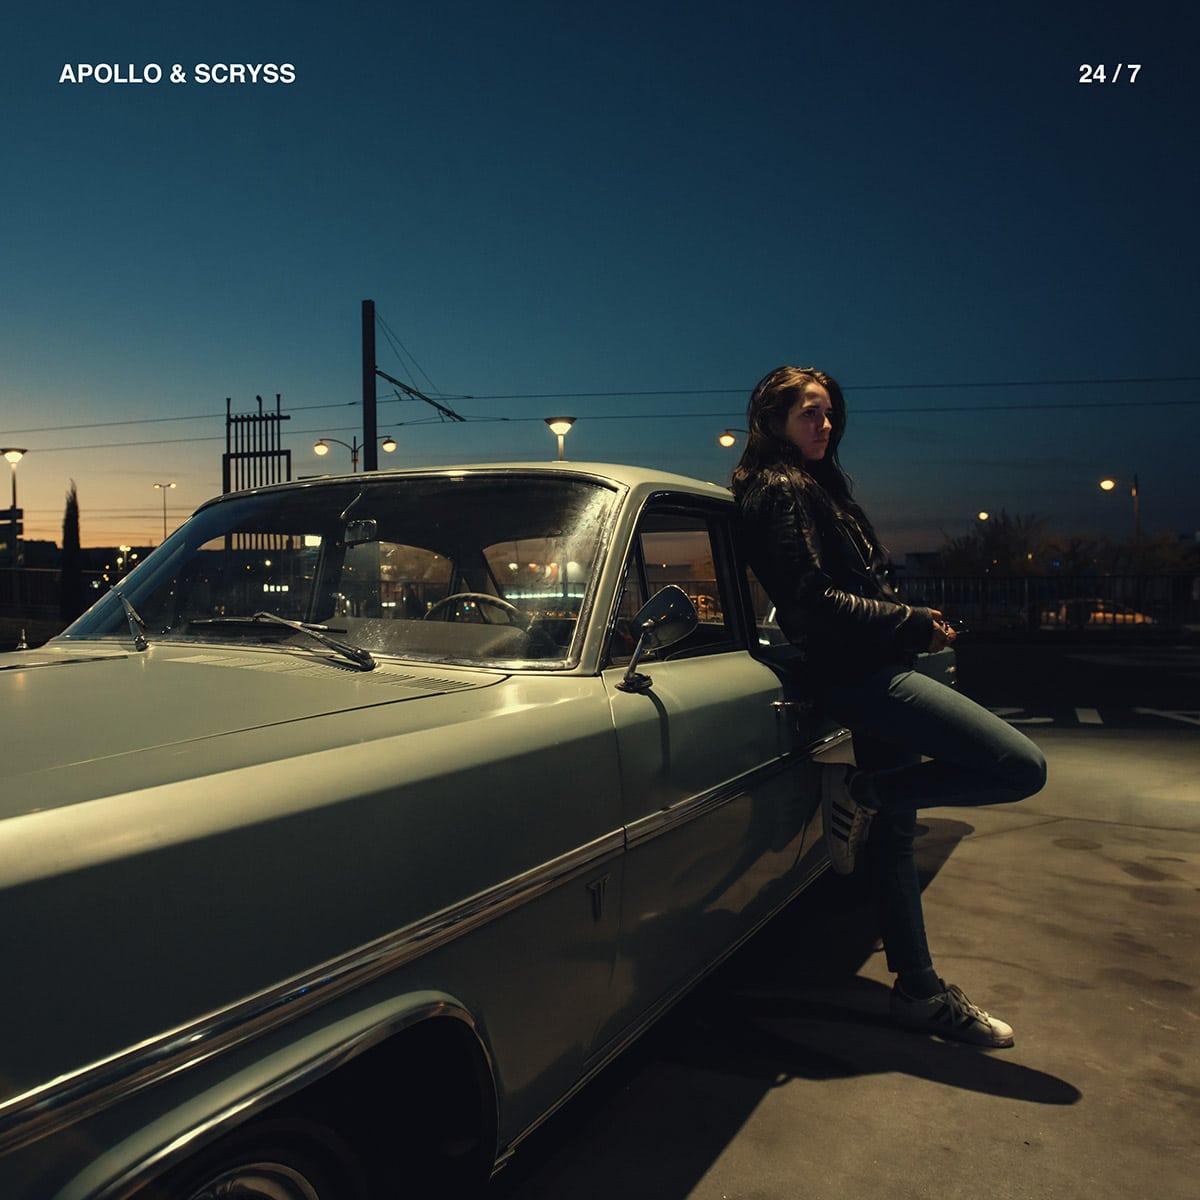 Cover album pochette apollo scryss 24/7 clermont ferrand rap hip hop edn prod